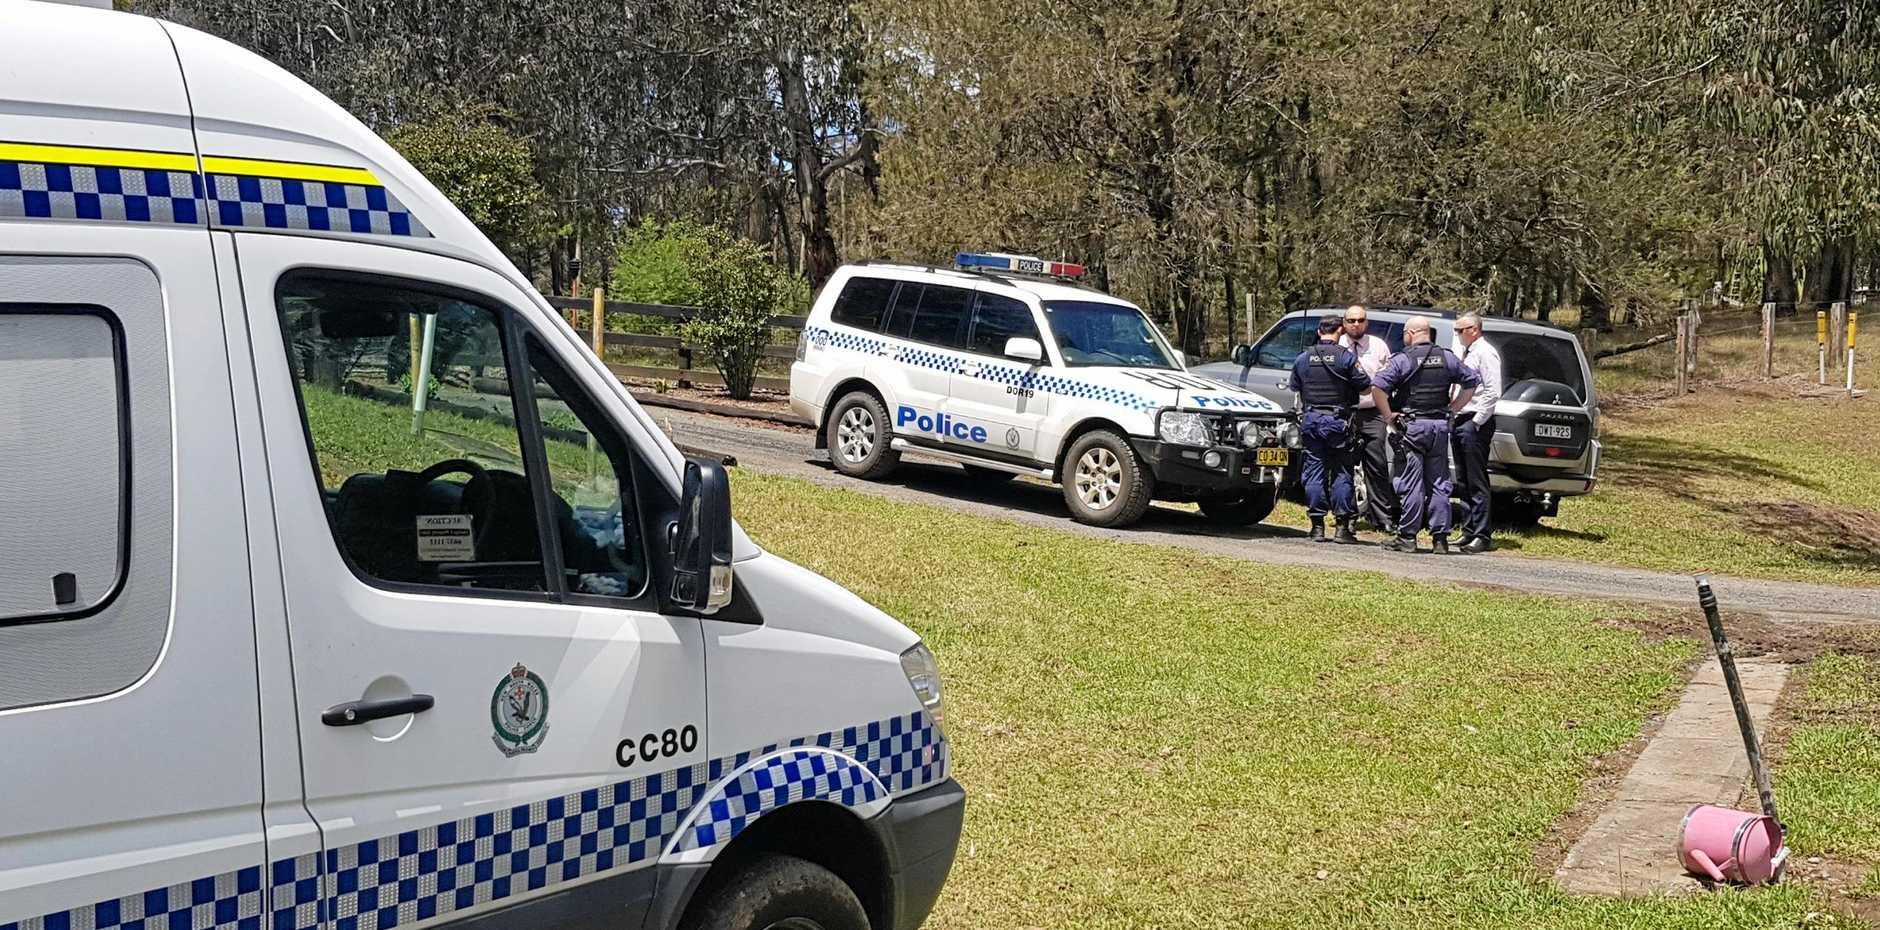 The crime scene at Dundurrabin where Darren Boardman was found suffering a gunshot woundto the torso.